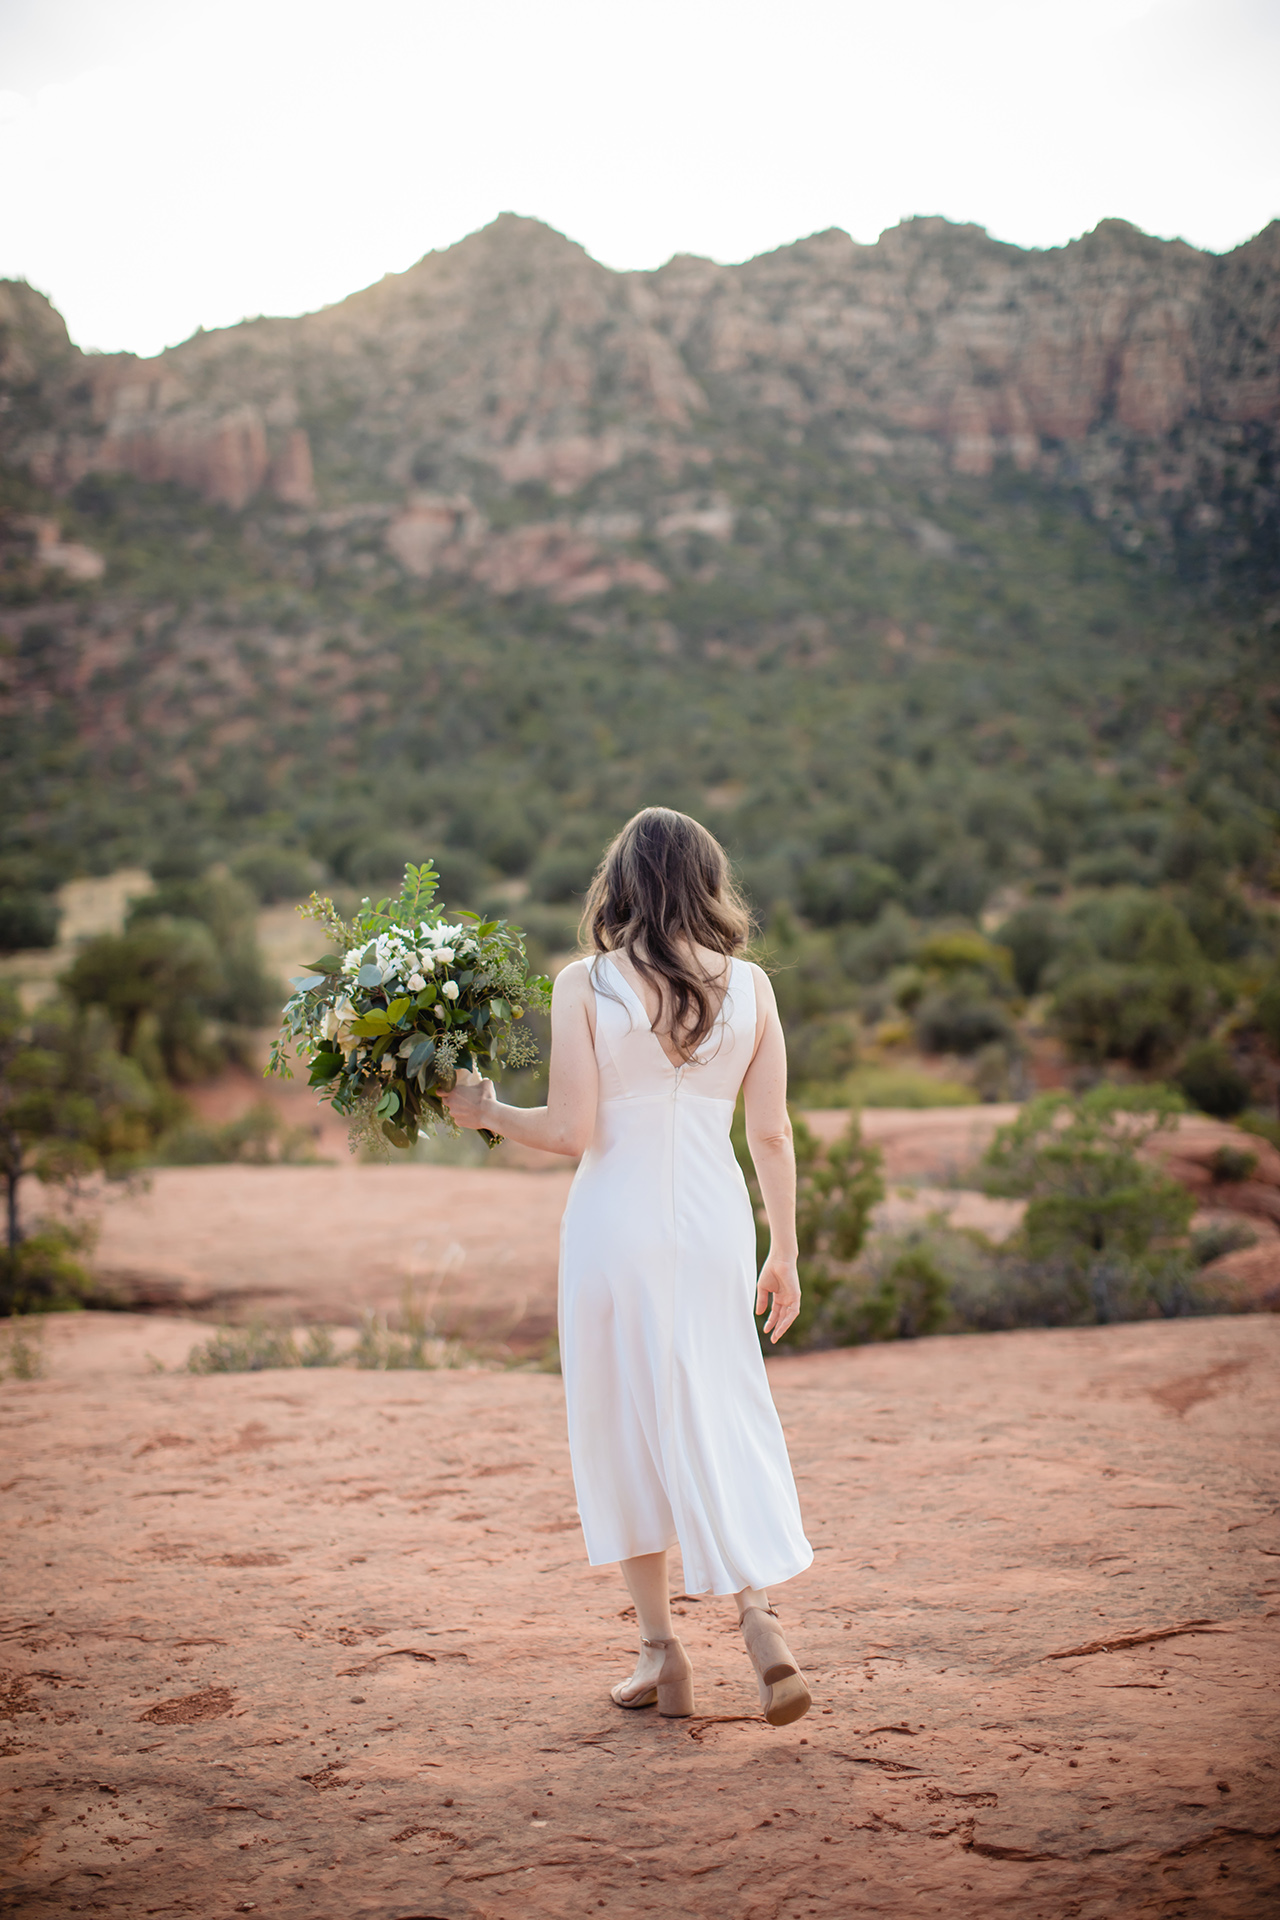 Wedding Photography for Sedona, AZ | the formidable red rocks define the desert landscape around her